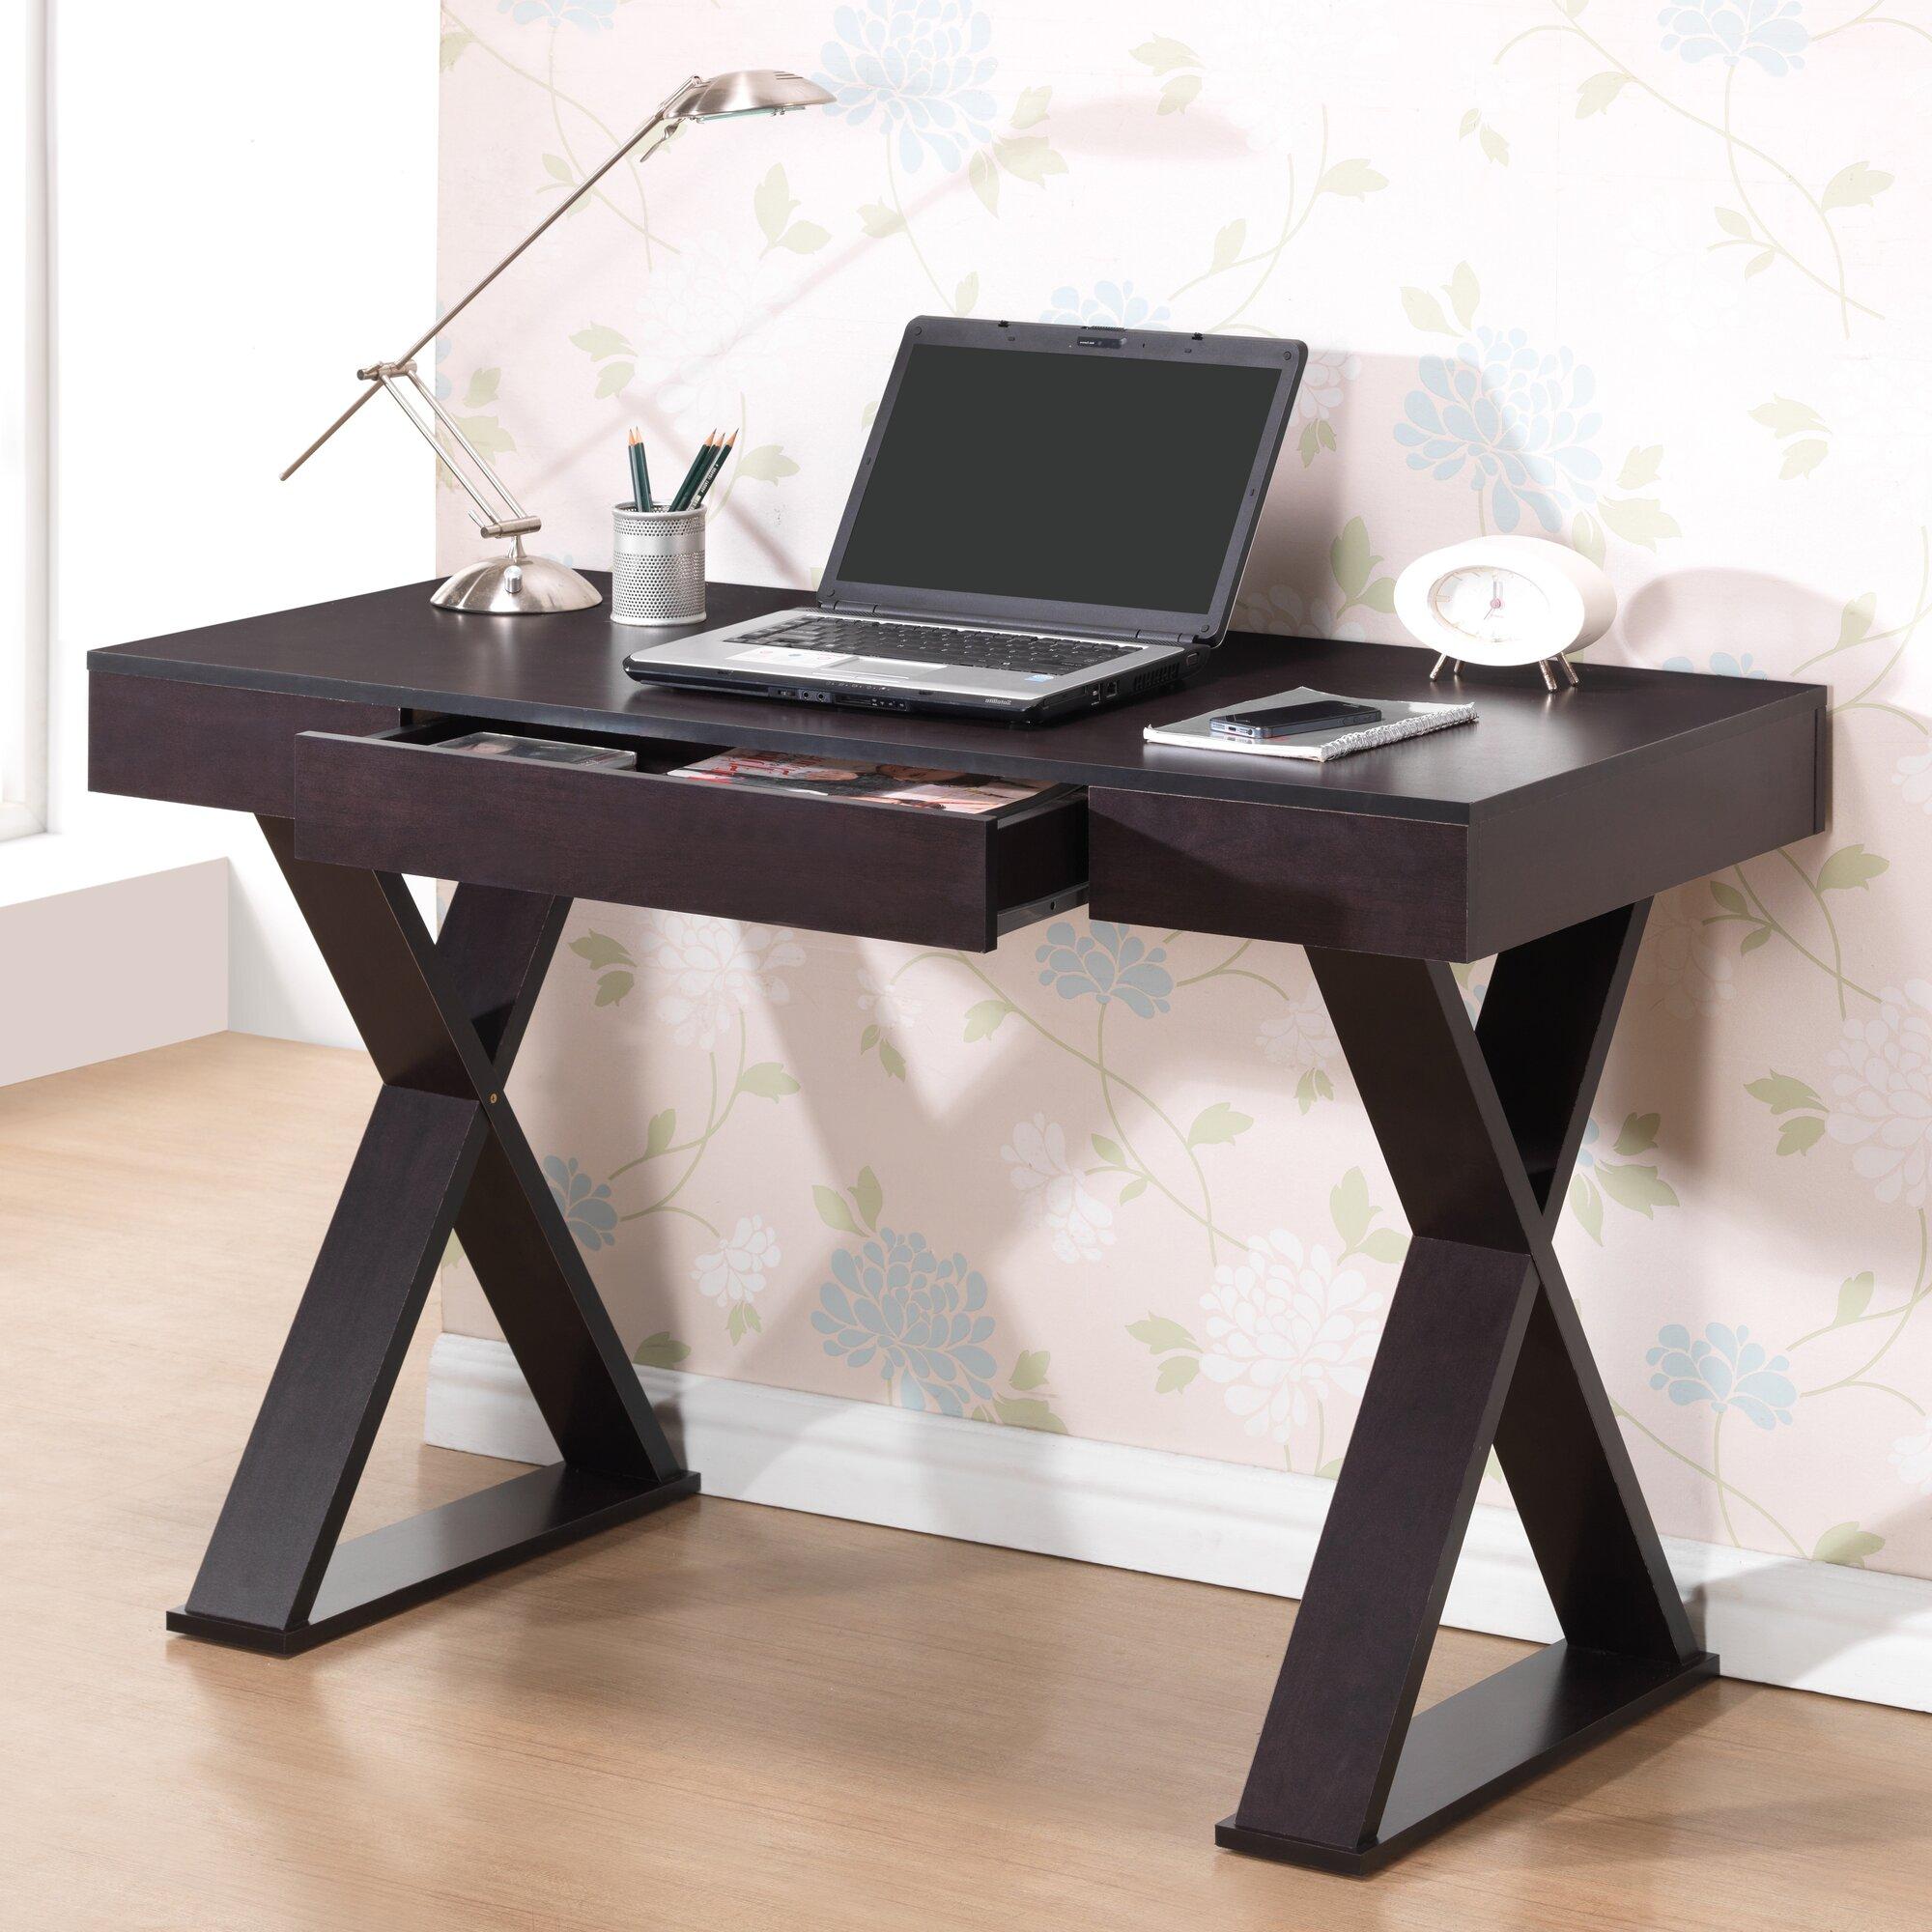 Trendy Desk Supplies: Techni Mobili Trendy Writing Desk & Reviews